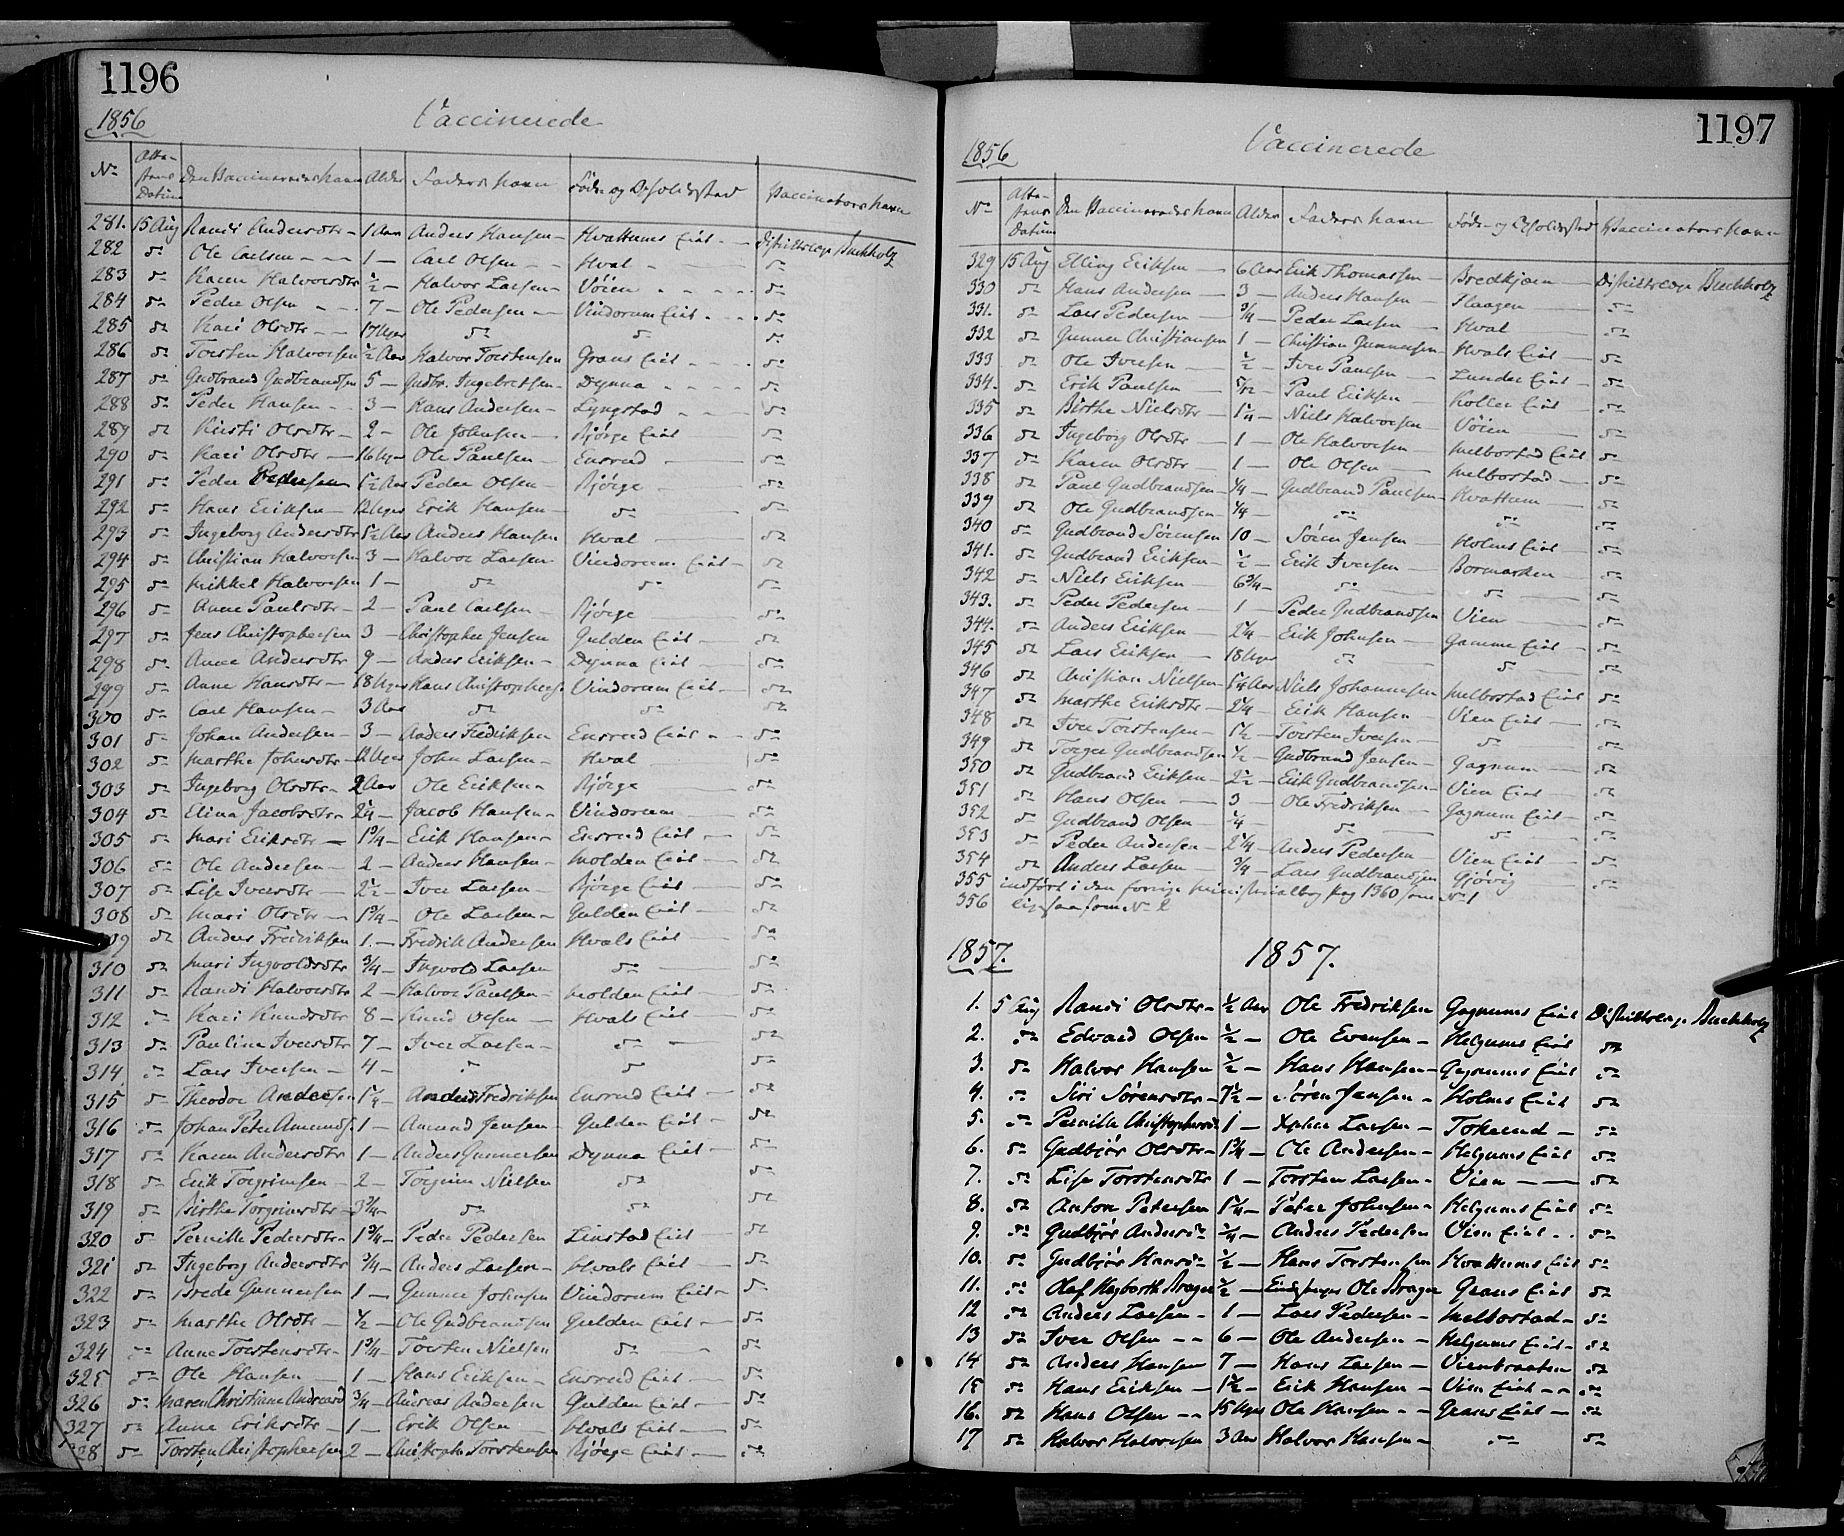 SAH, Gran prestekontor, Ministerialbok nr. 12, 1856-1874, s. 1196-1197